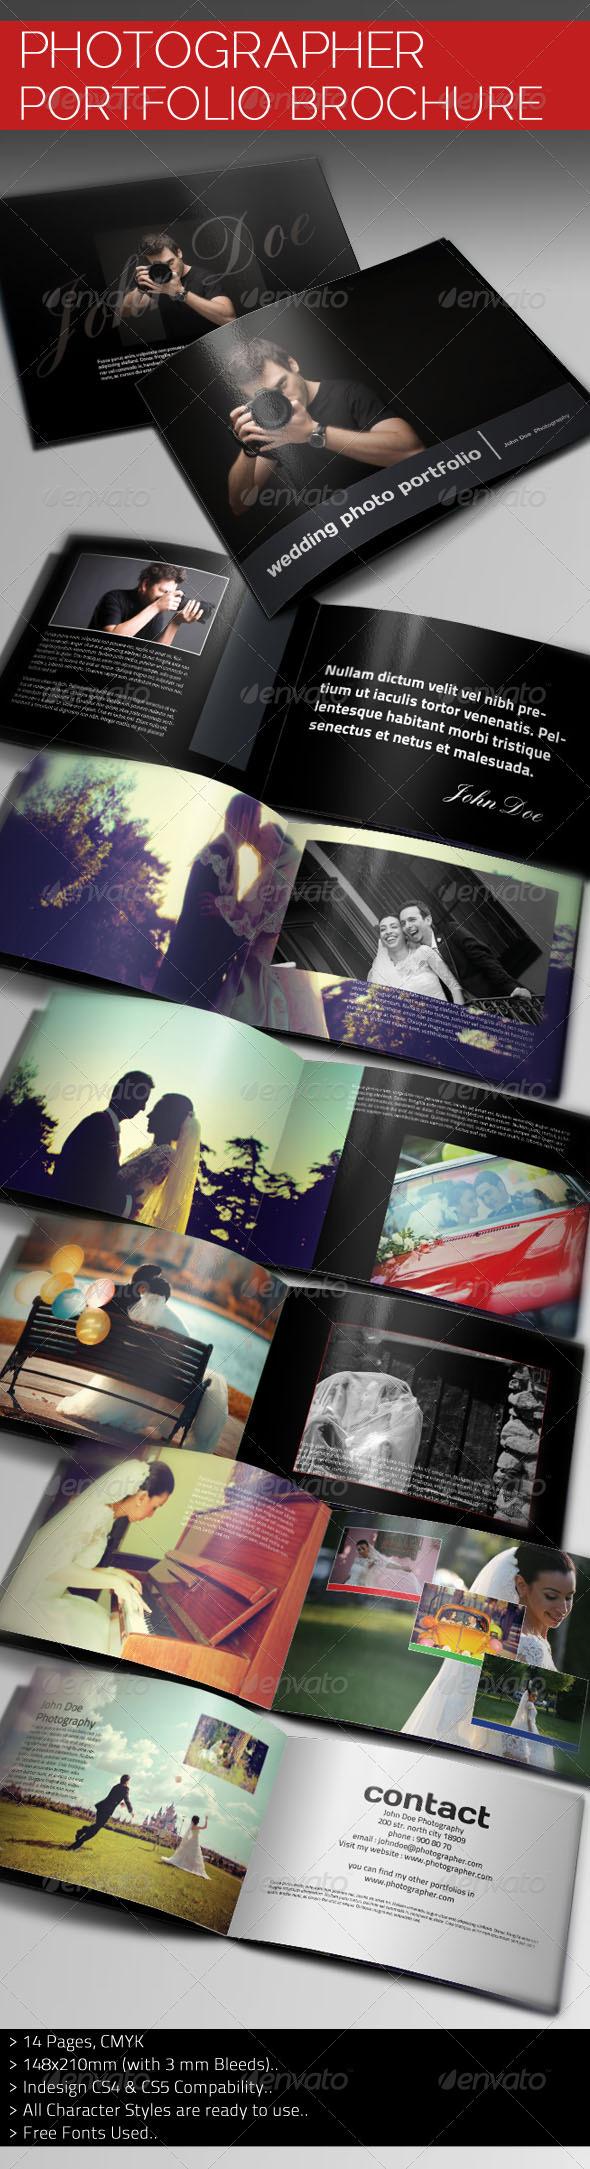 Photographer Portfolio Brochure Template